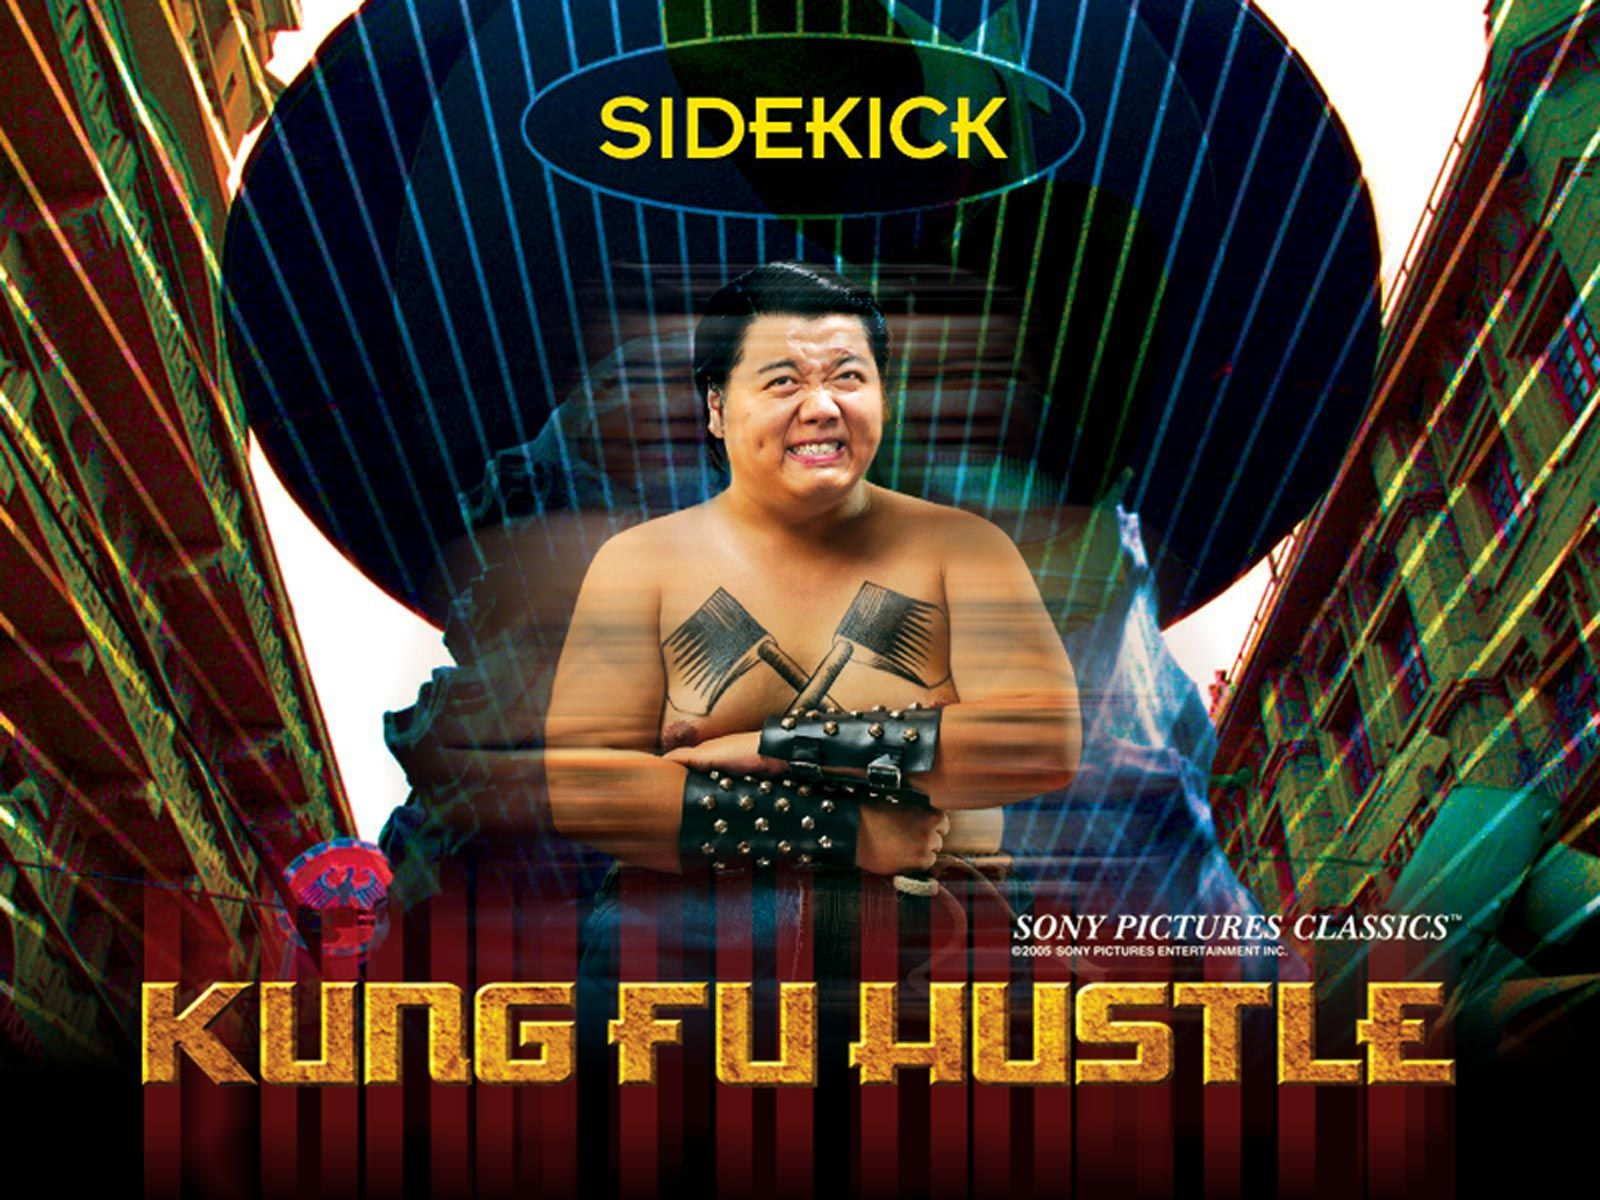 Fu hustler kung consider, that